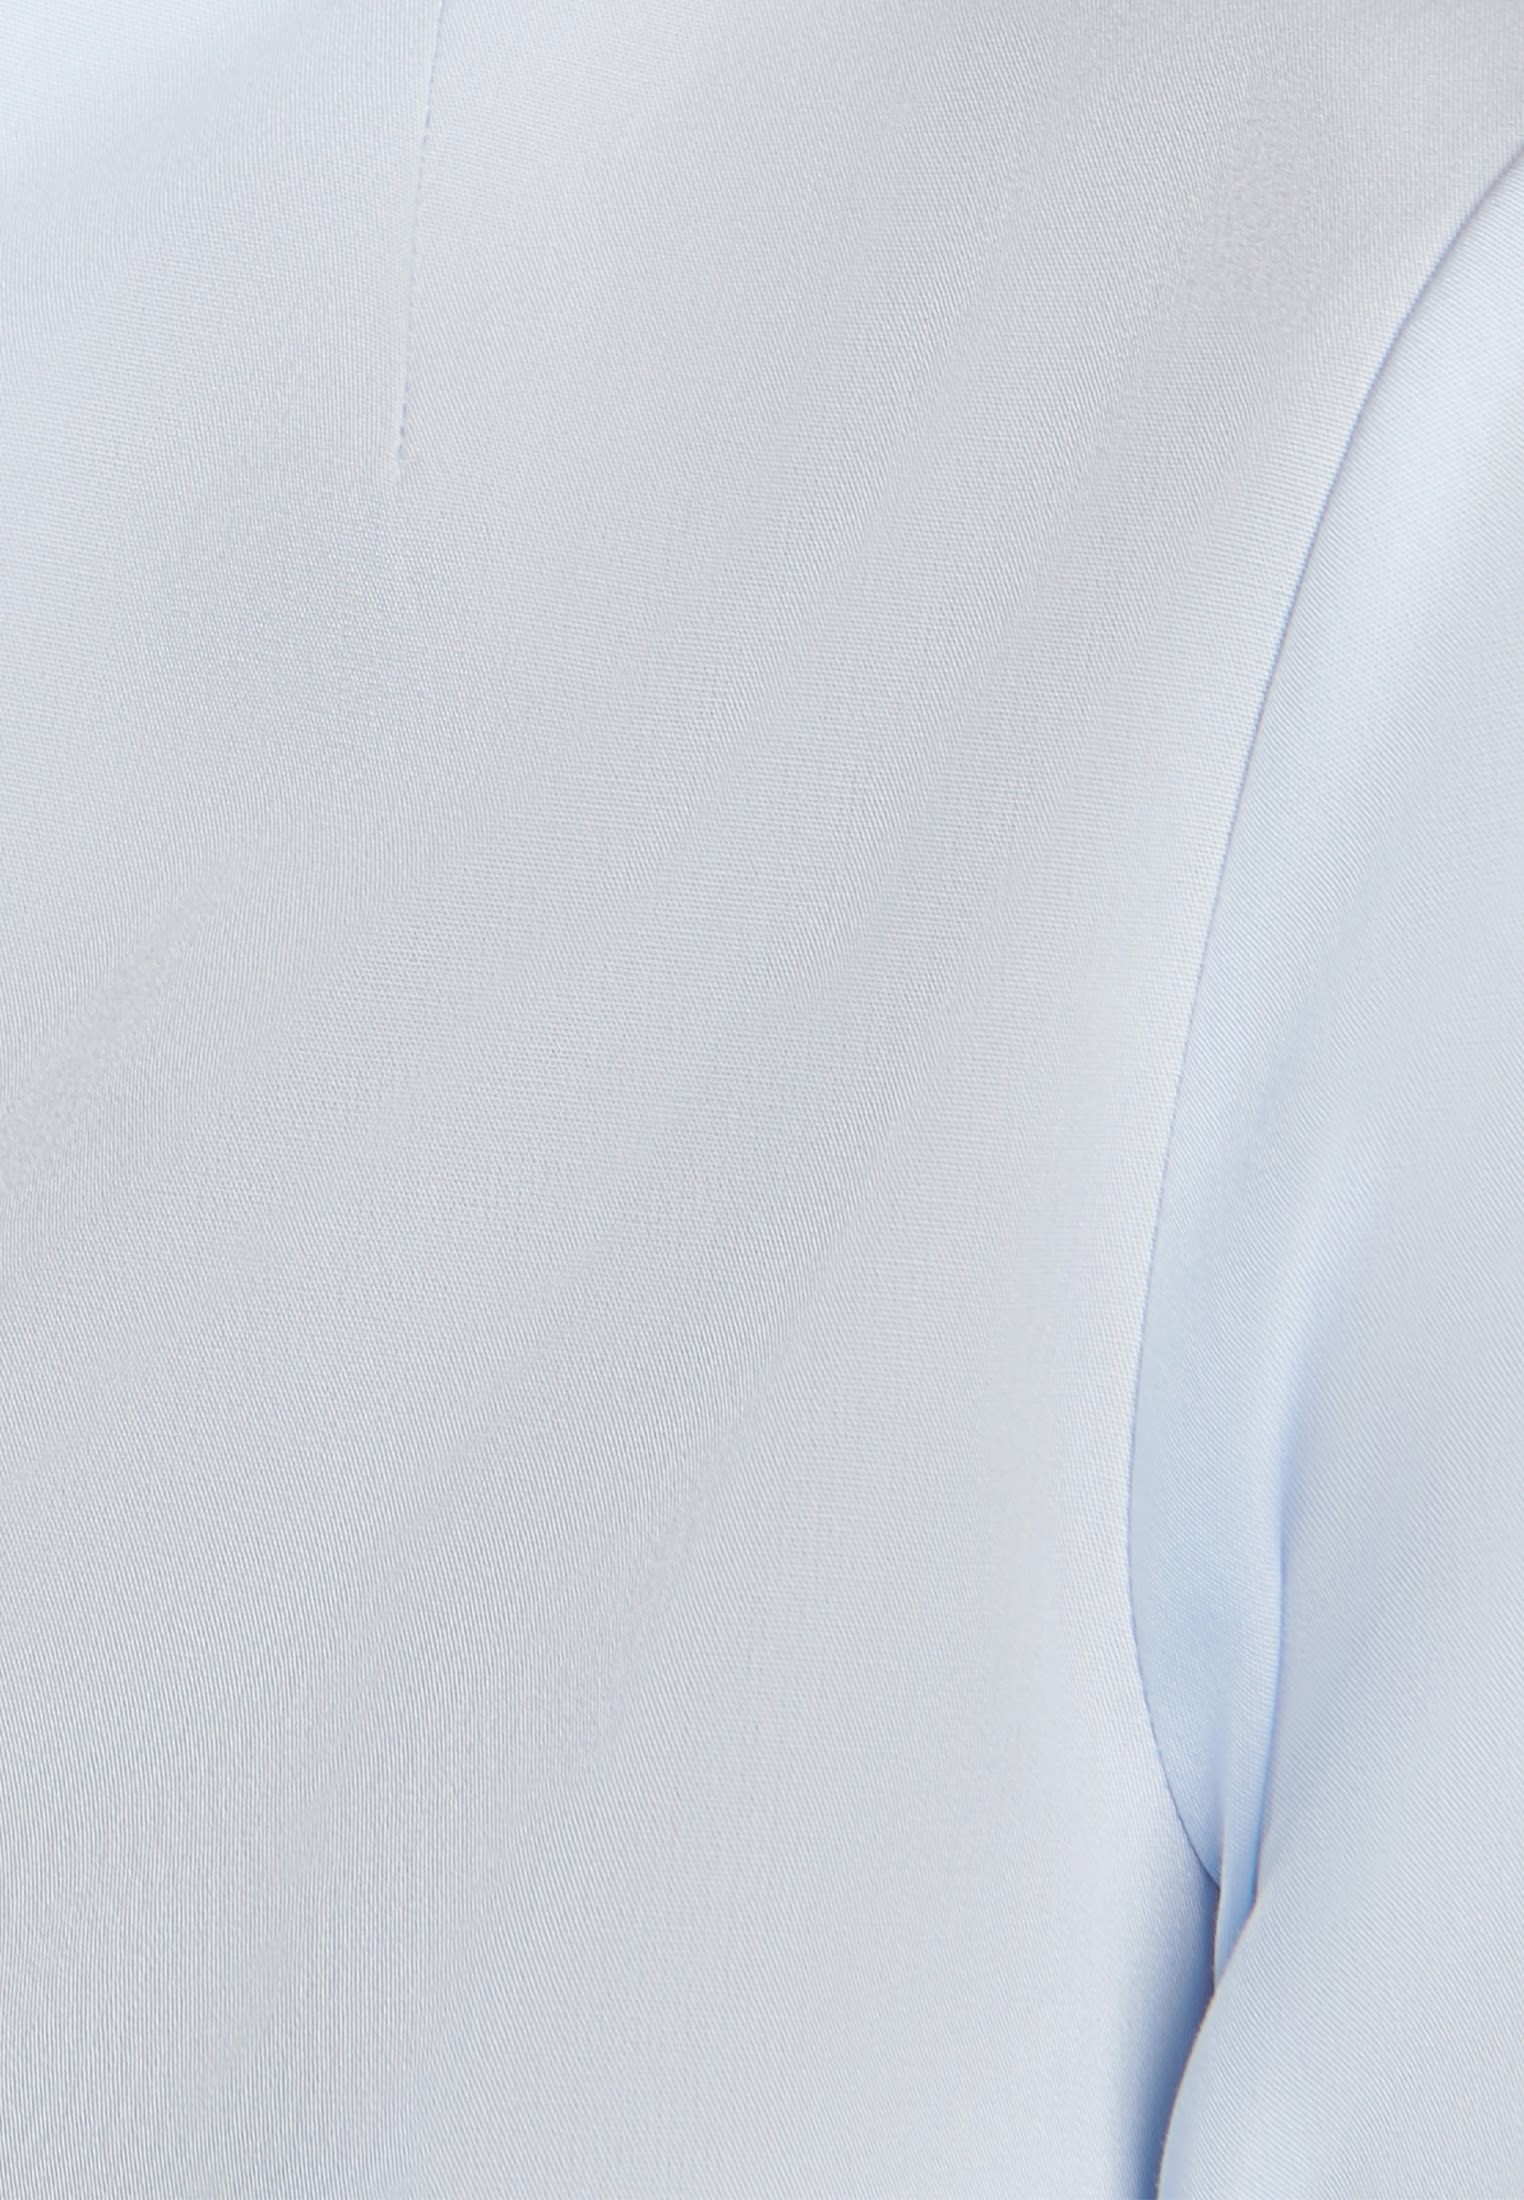 Bügelfreie Popeline Kelchkragenbluse aus 100% Baumwolle in Hellblau |  Seidensticker Onlineshop